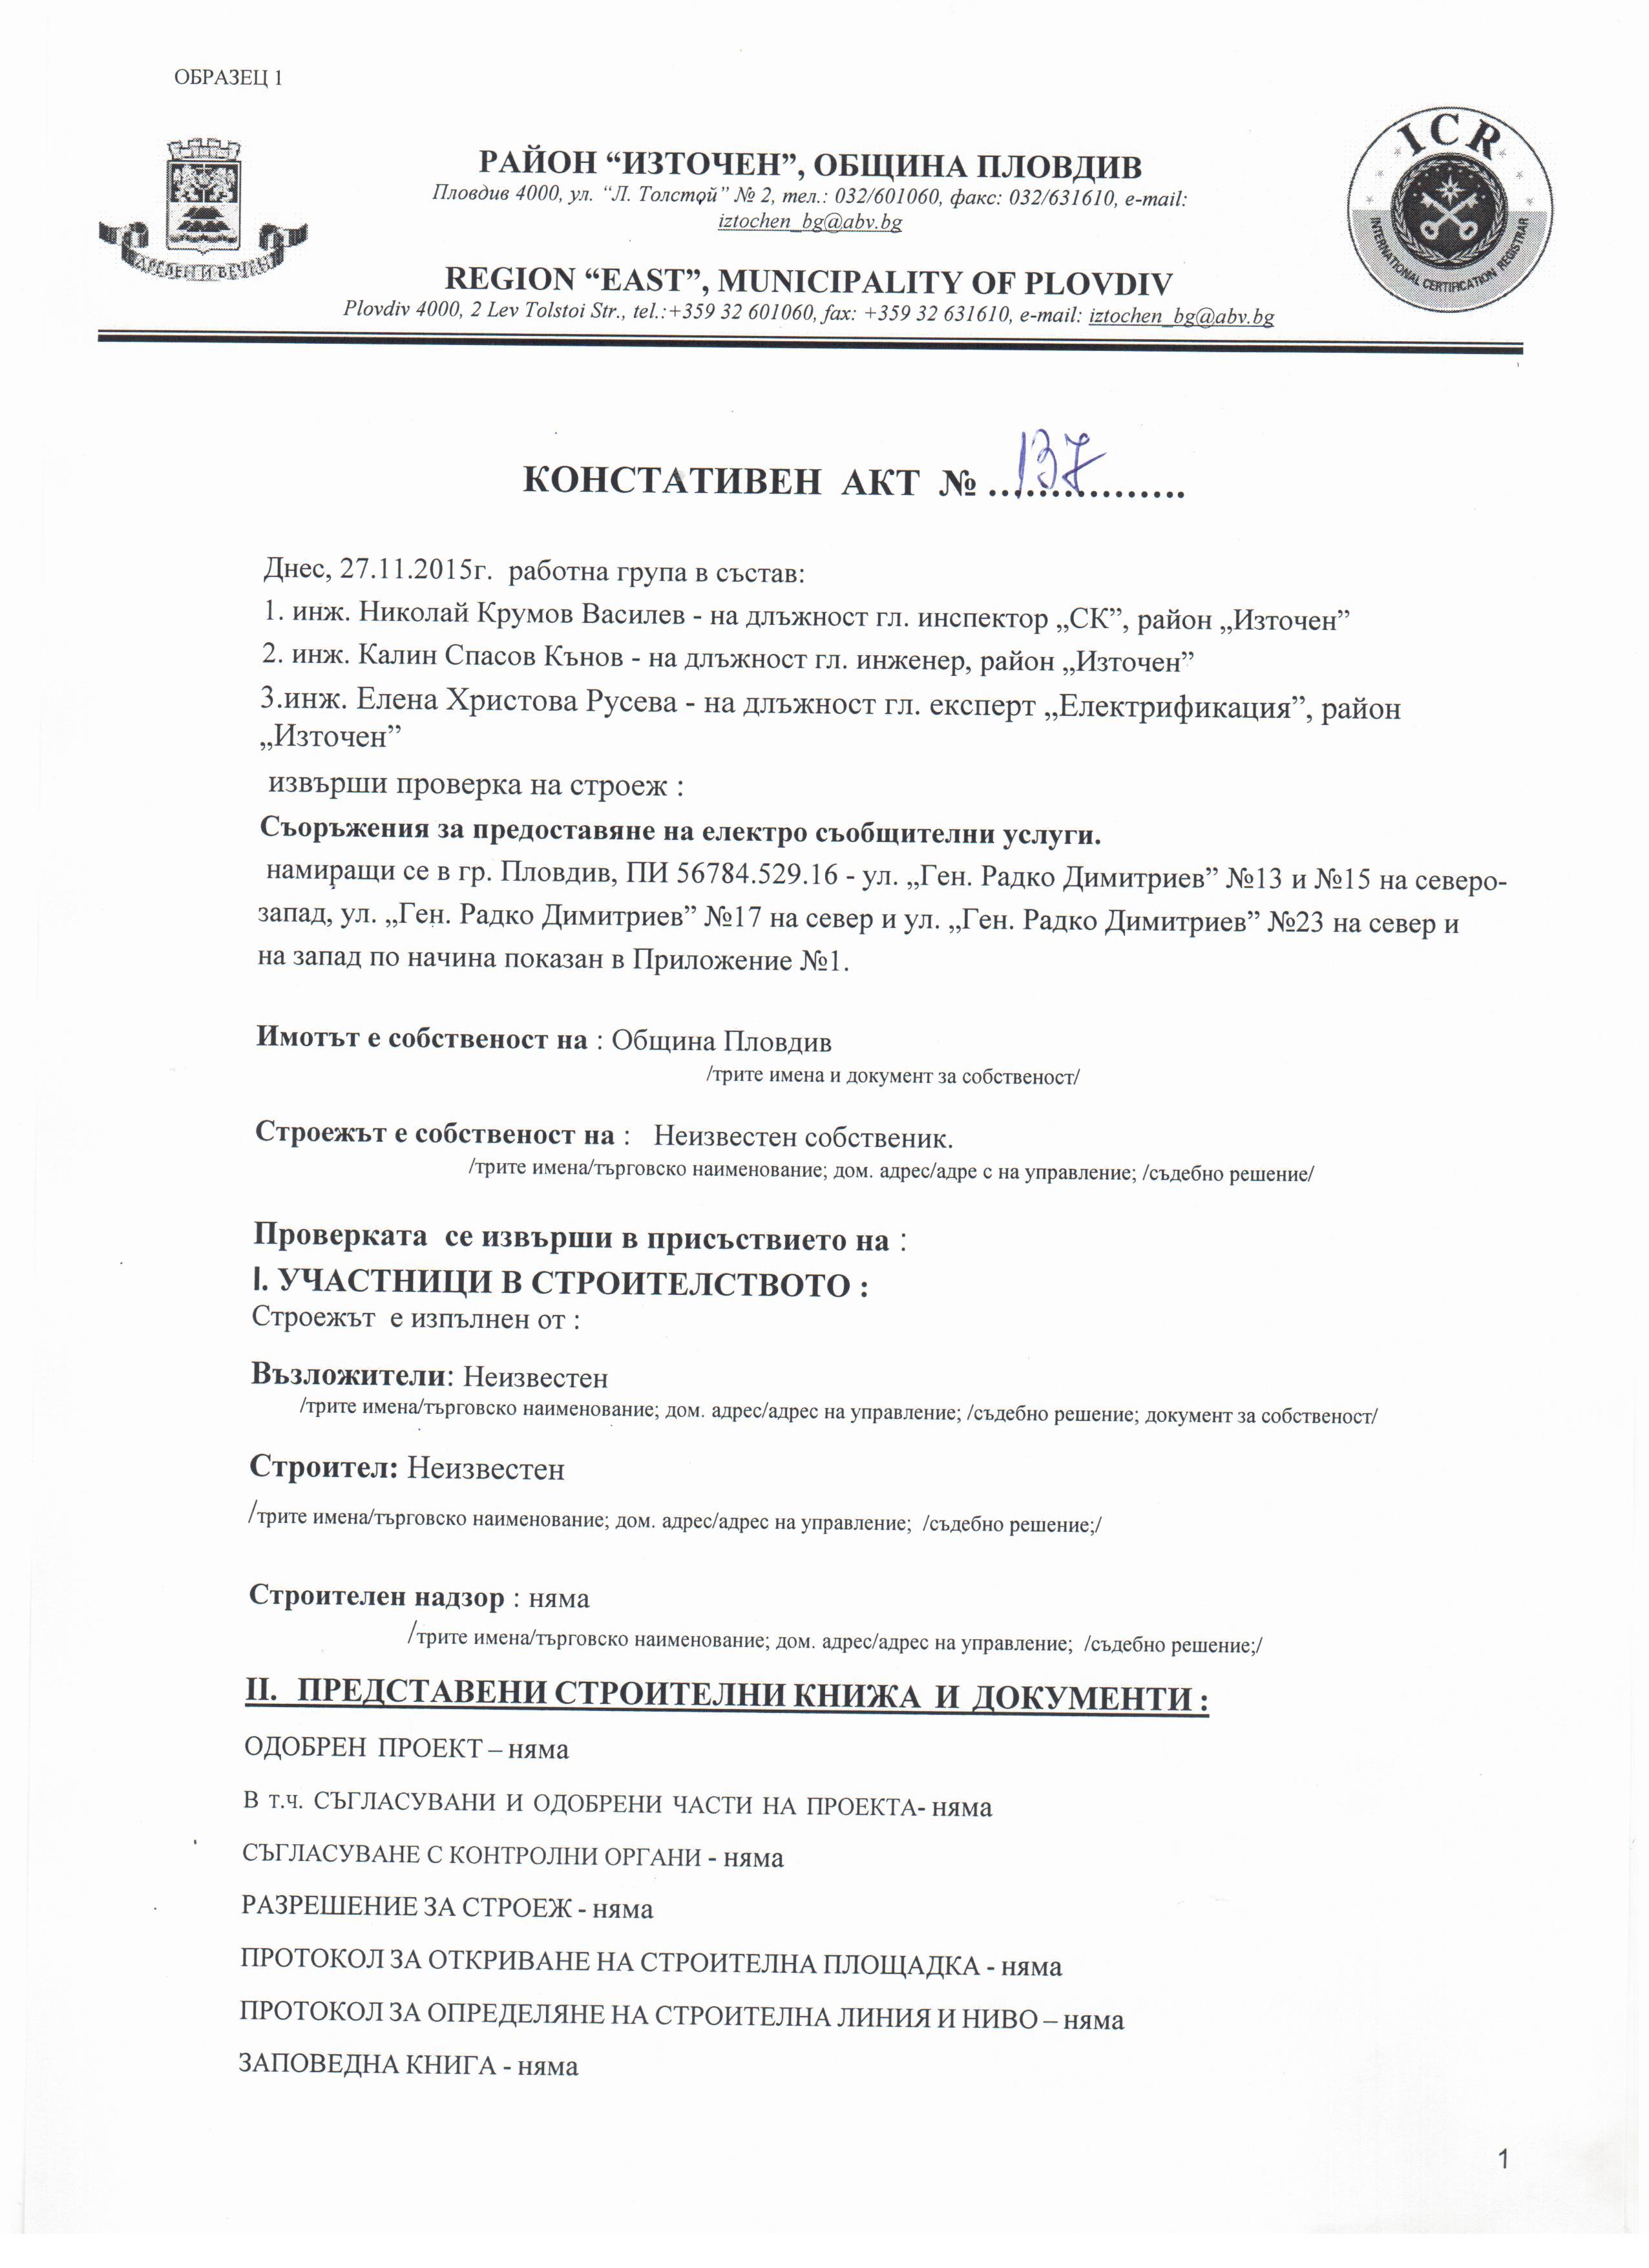 KONSTATIVEN_AKT_№1371